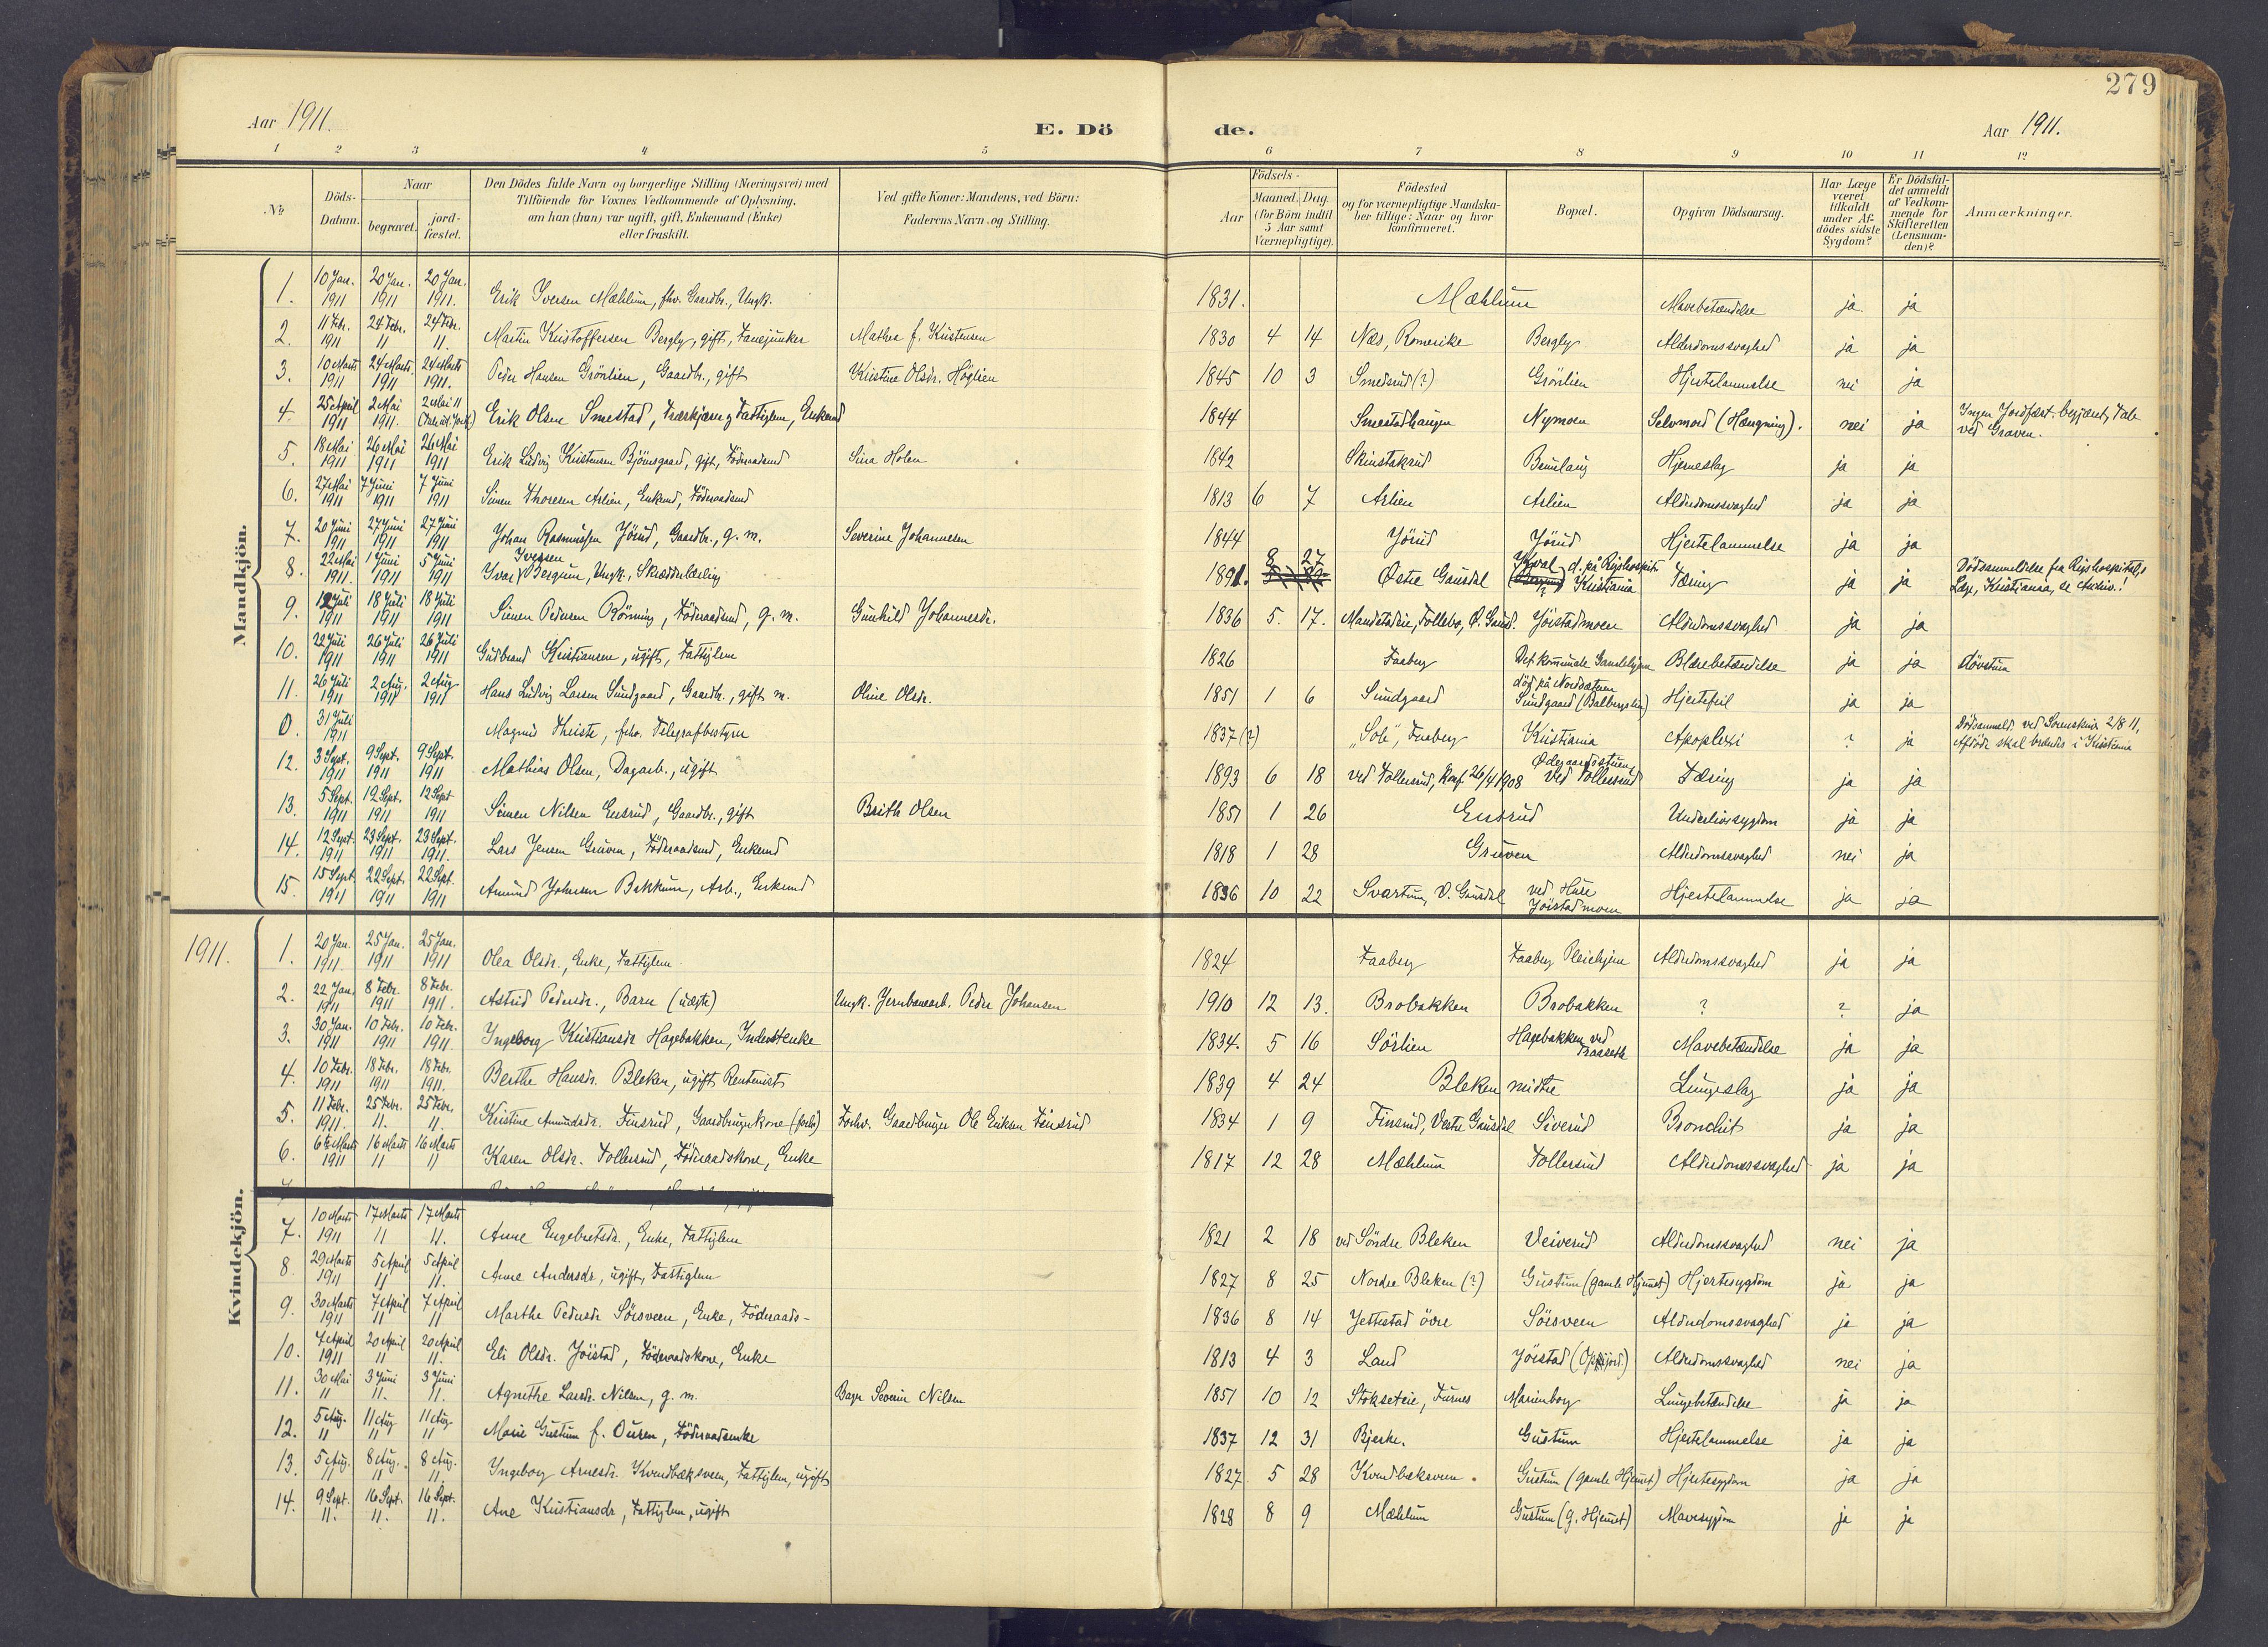 SAH, Fåberg prestekontor, Ministerialbok nr. 12, 1899-1915, s. 279